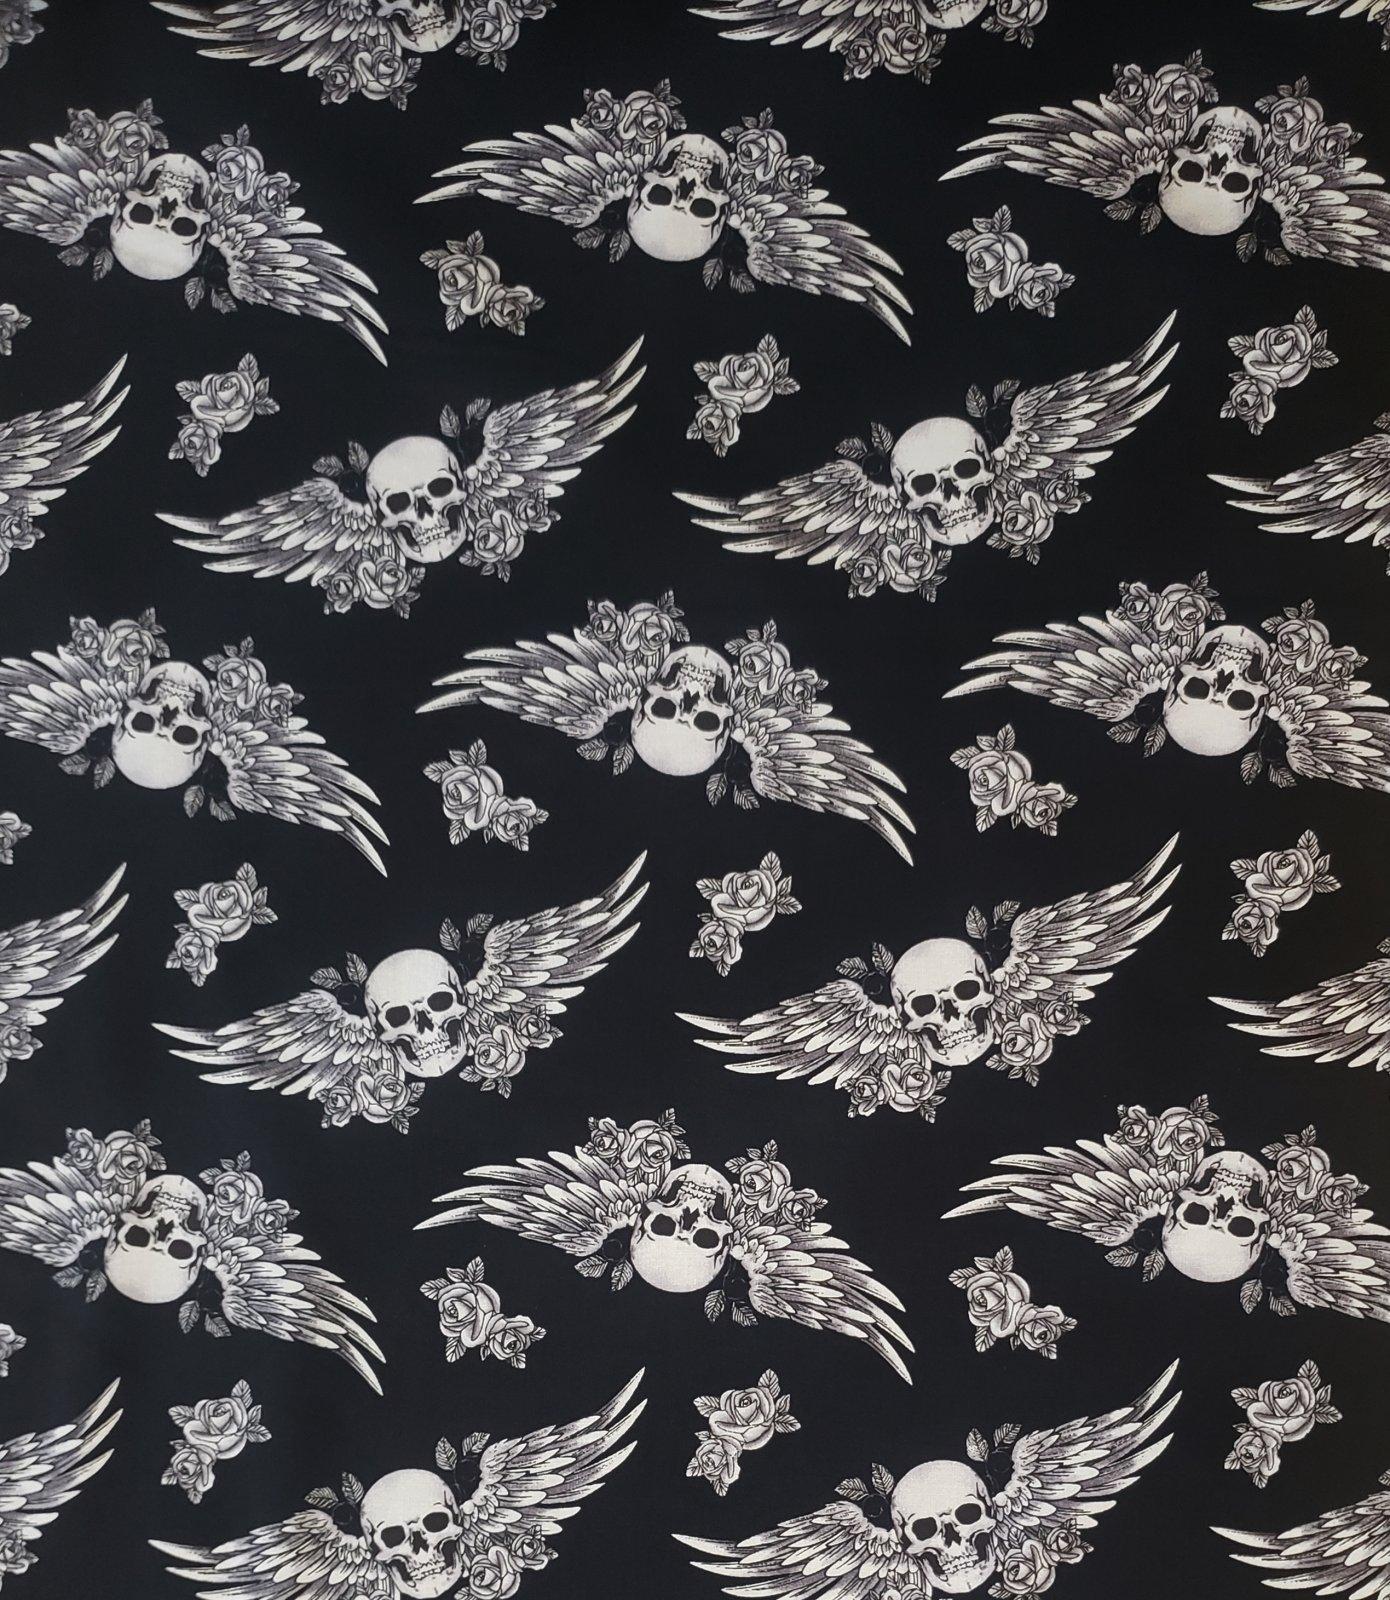 Skulls and Wings 17595 Black